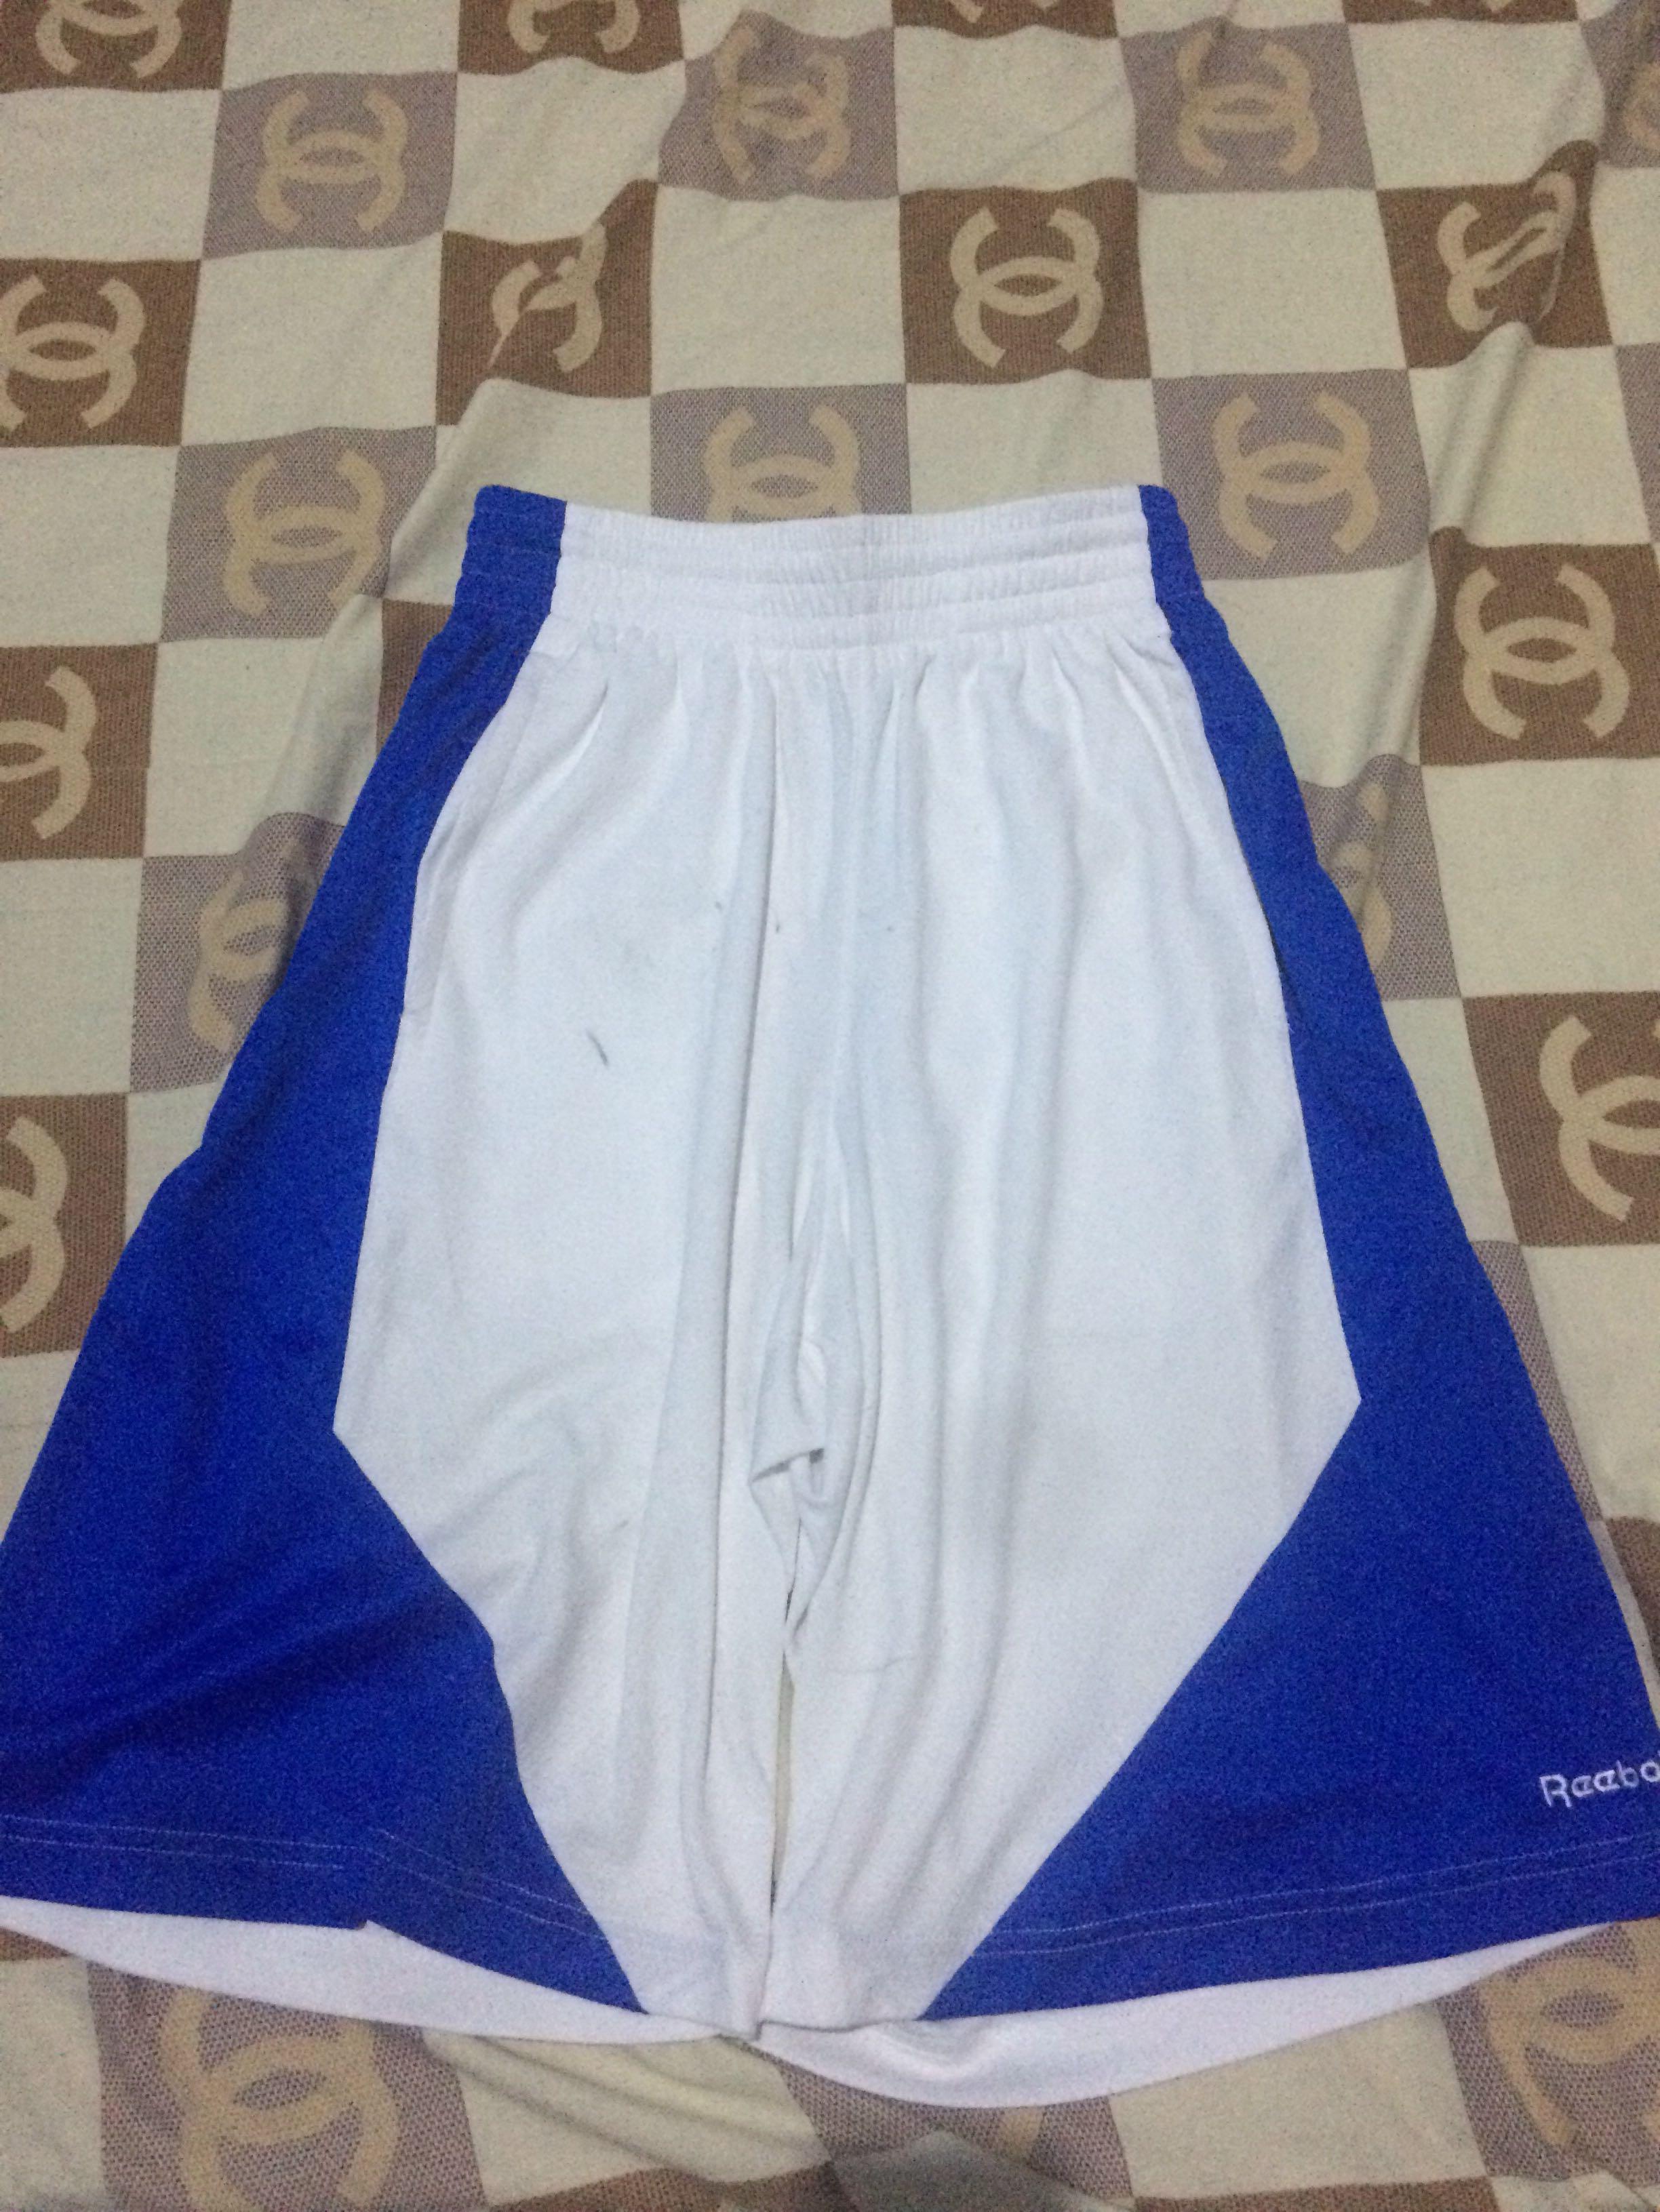 Celana Basket Reebok White Blue